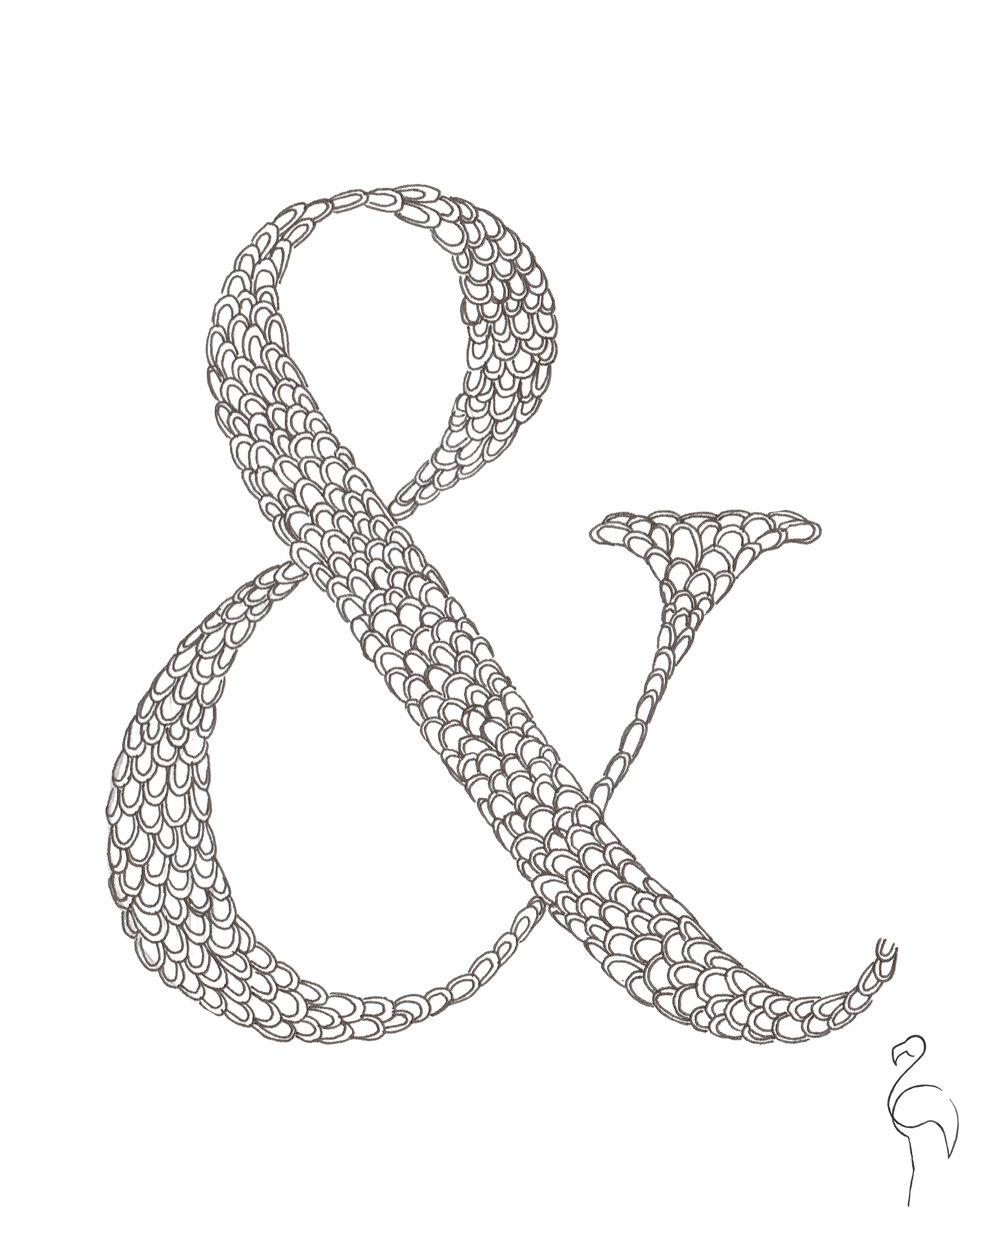 Brazzlebird - Ampersand Drawing Scales.jpg